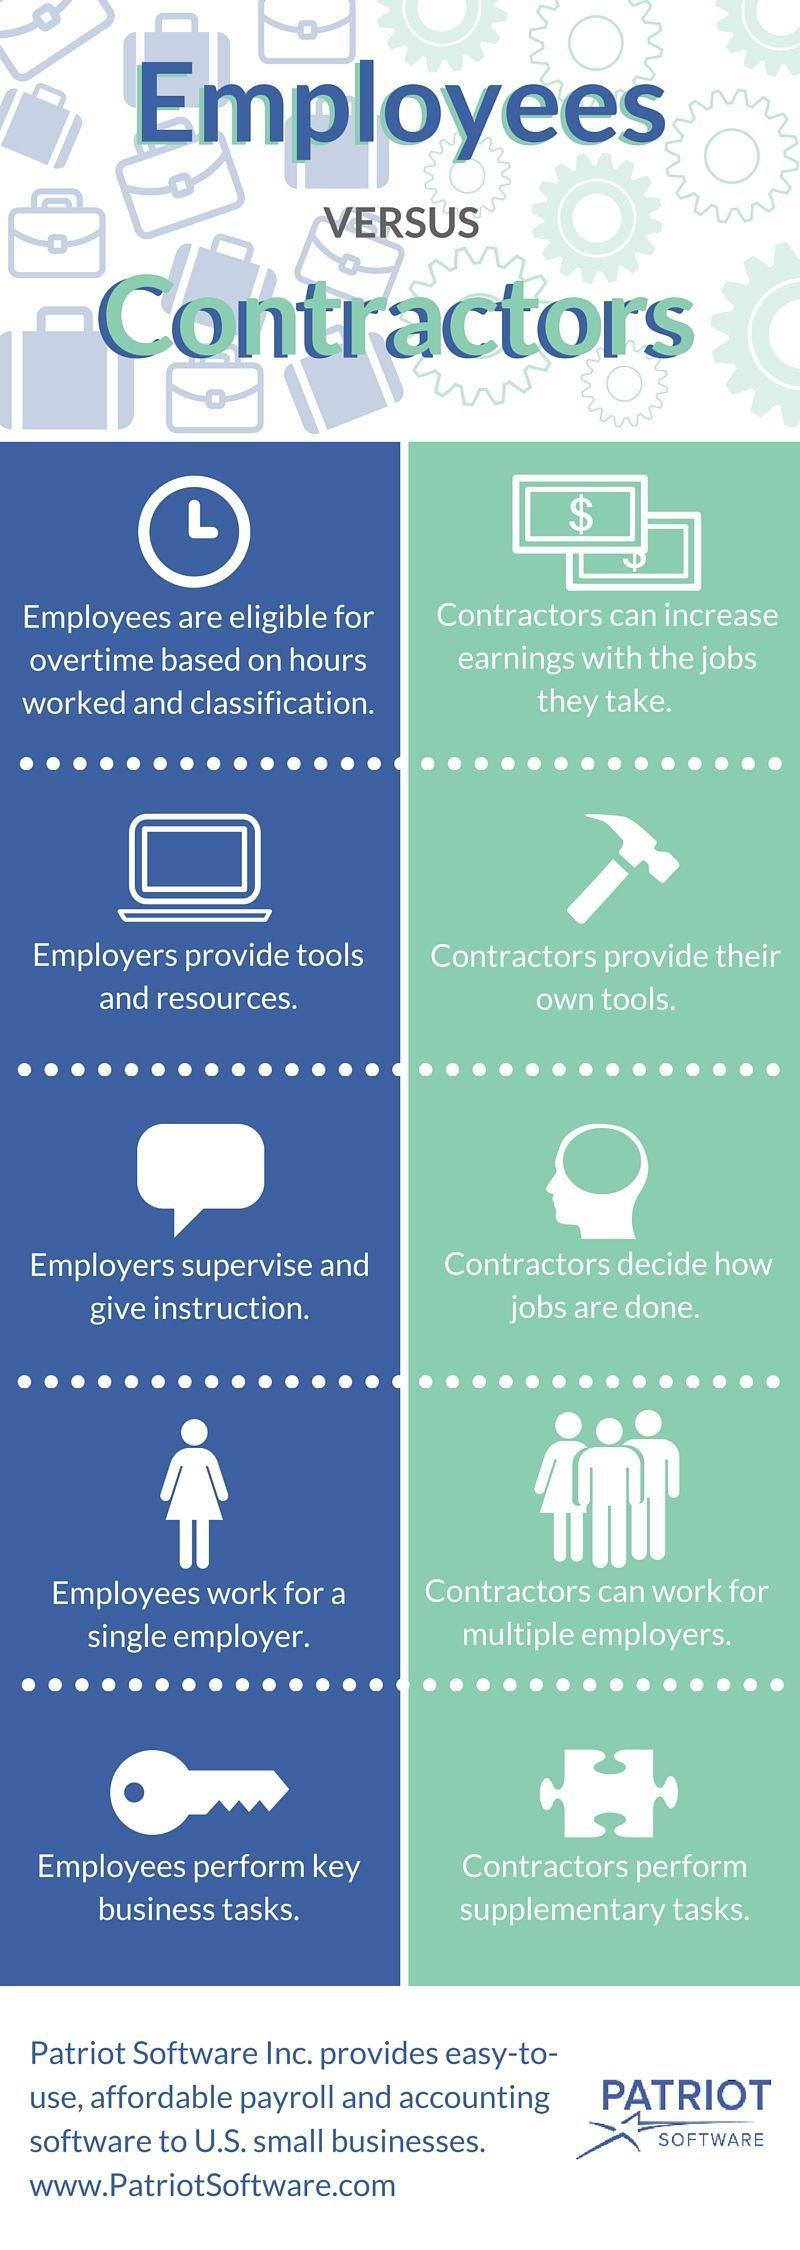 Classifying Independent Contractors Vs Employees Infographic Infographic Marketing Infographic Big Data